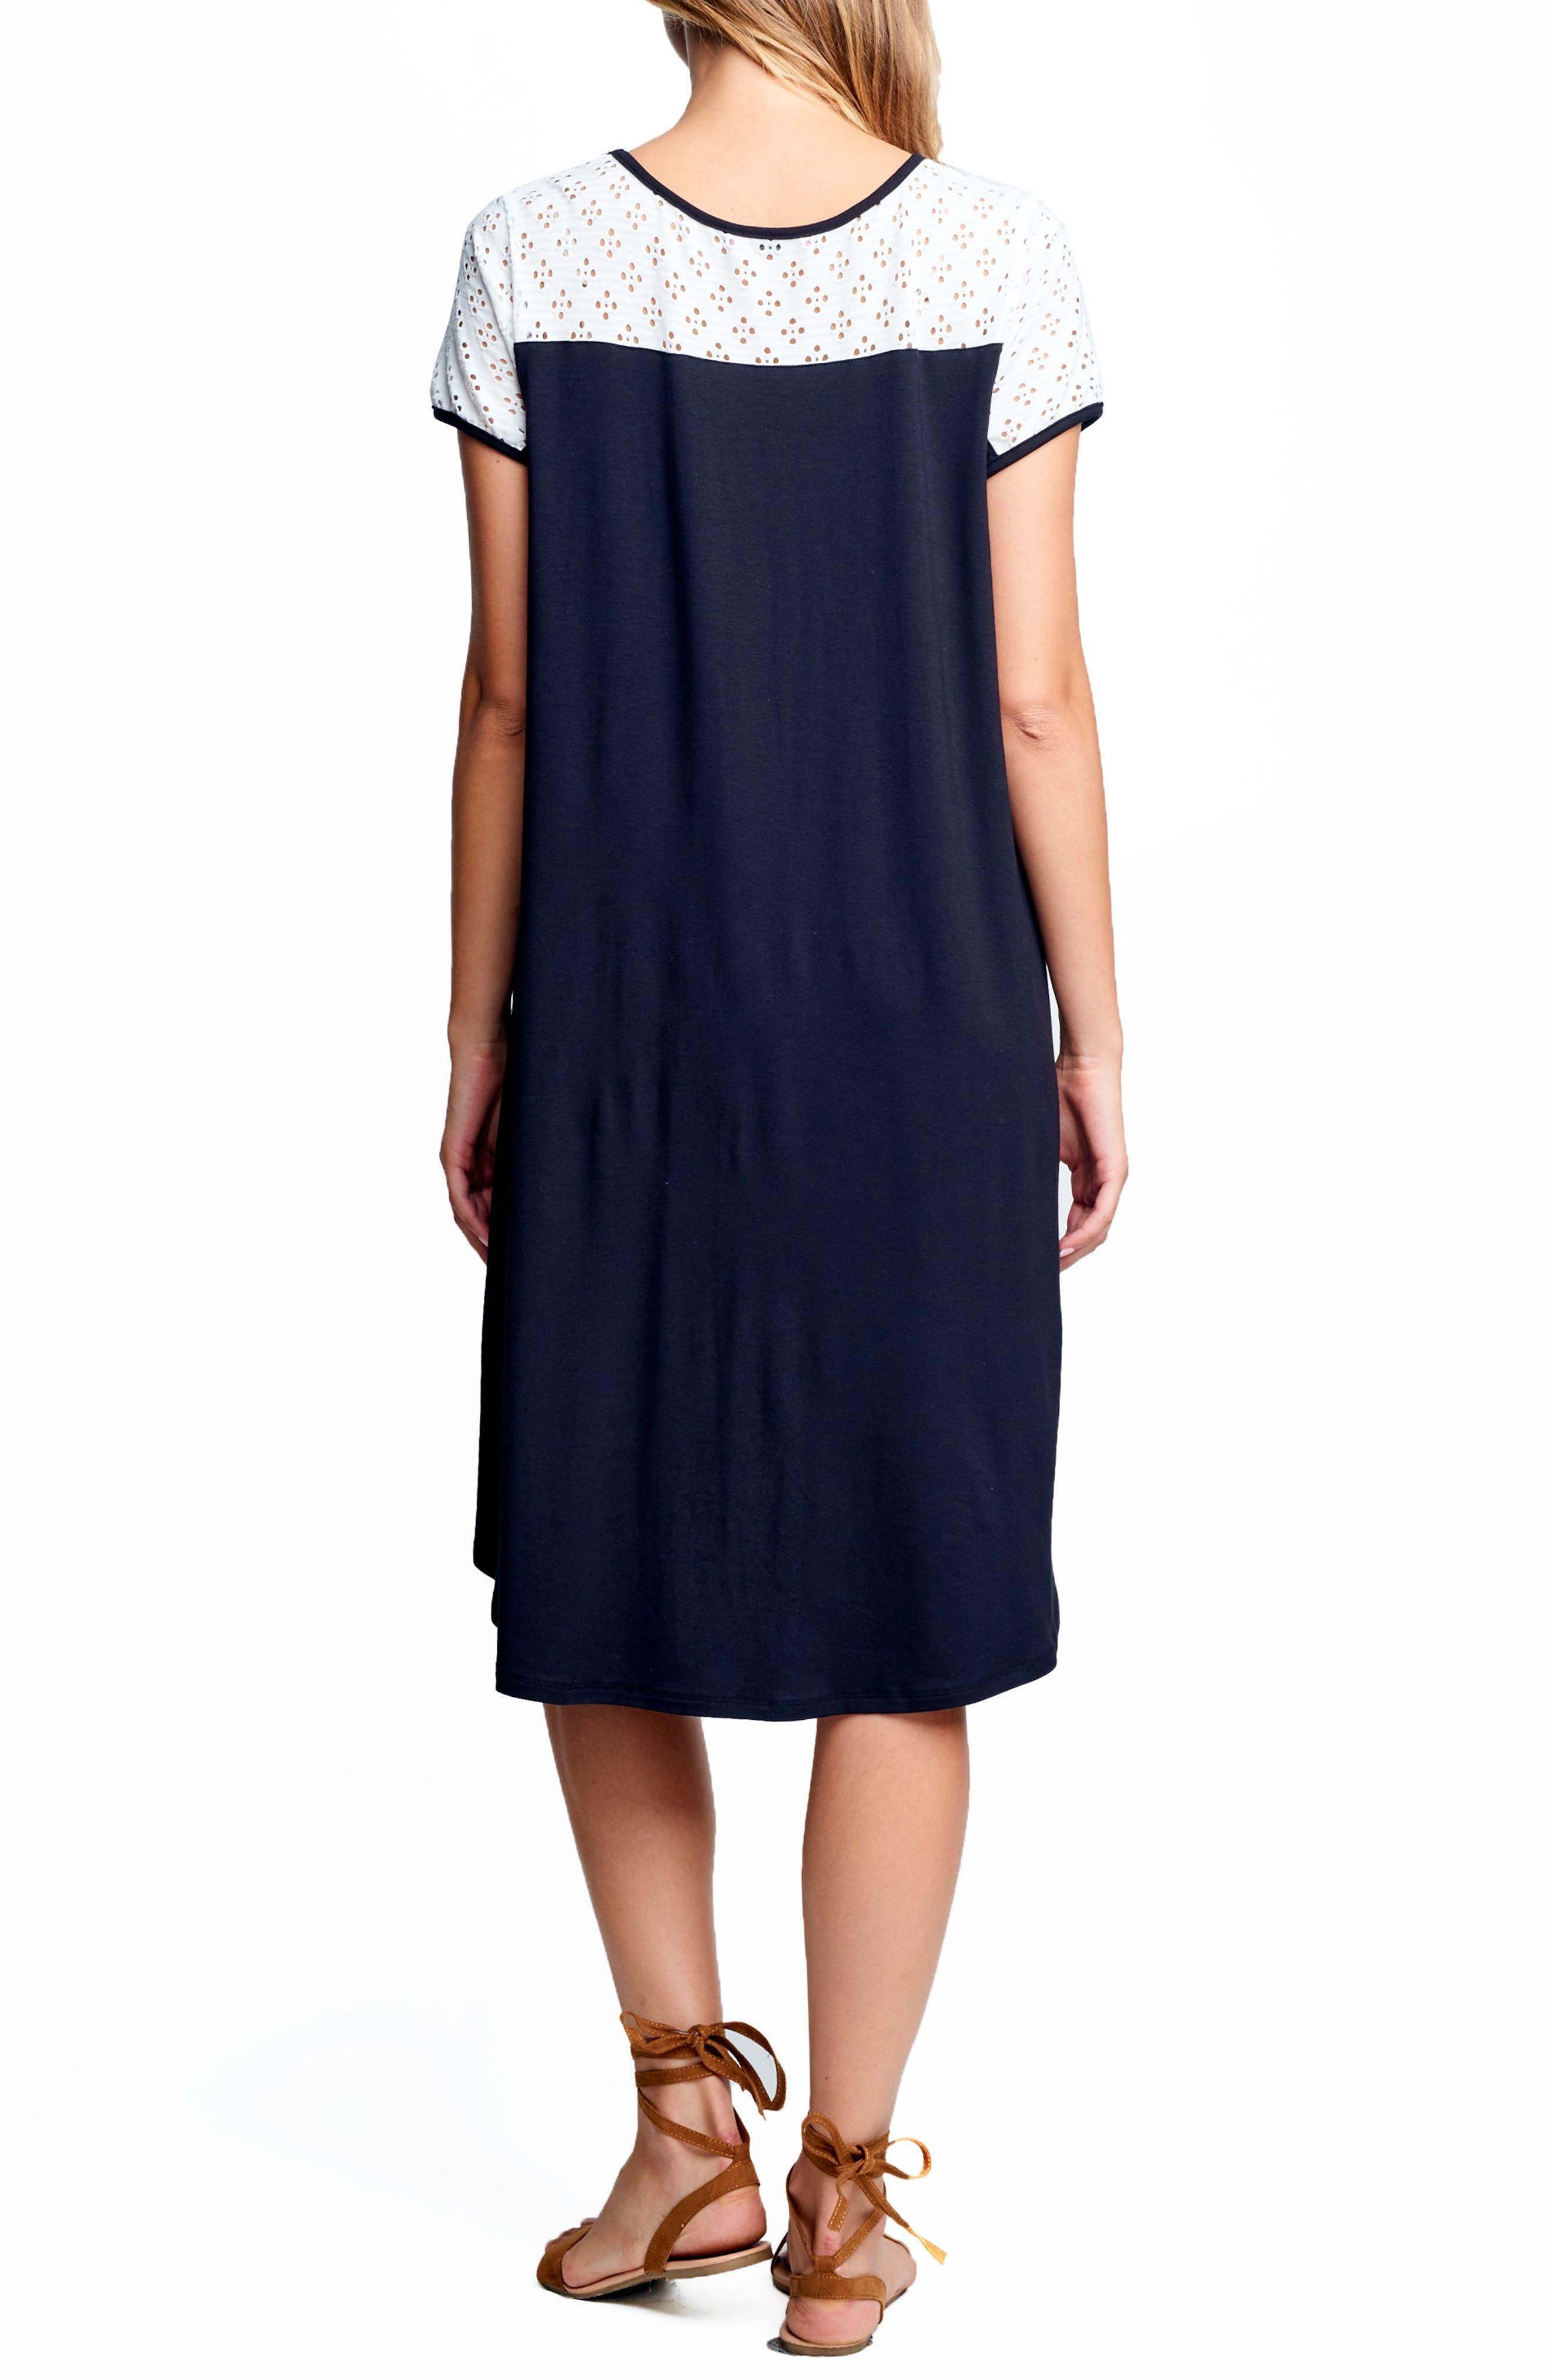 MATERNAL AMERICA, Drape High/Low Maternity Dress, Alternate thumbnail 2, color, 100